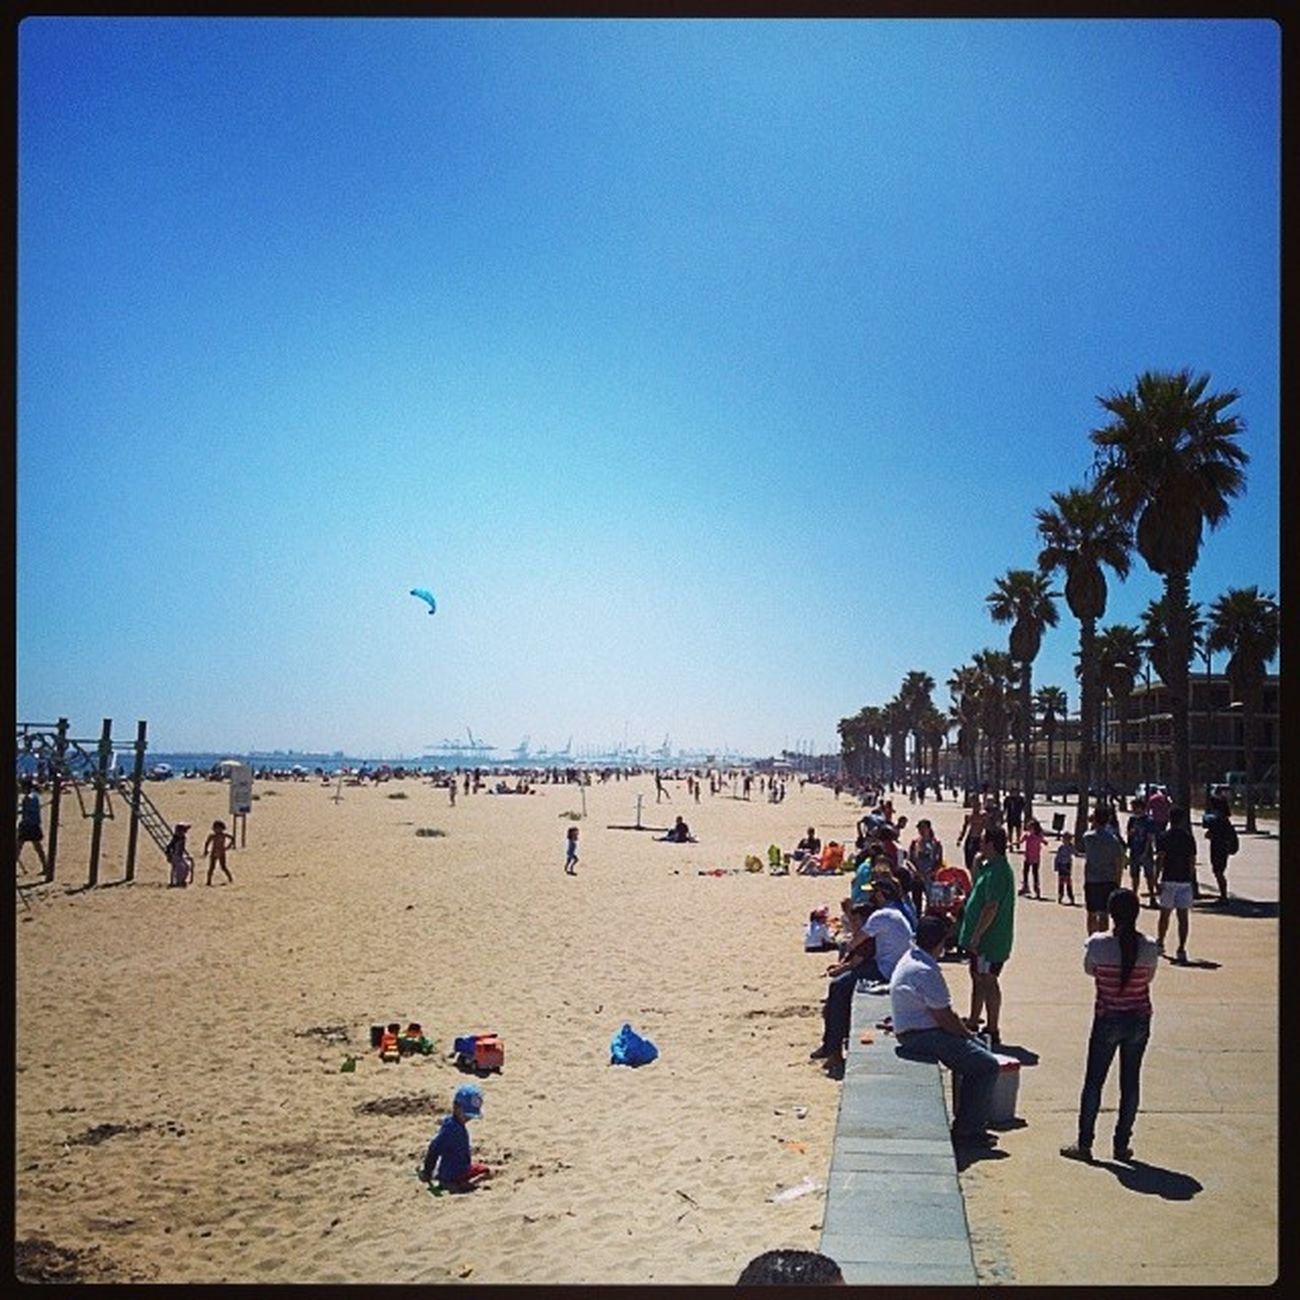 Playa de Alboraya. Playa Ranta València Aitoespanja